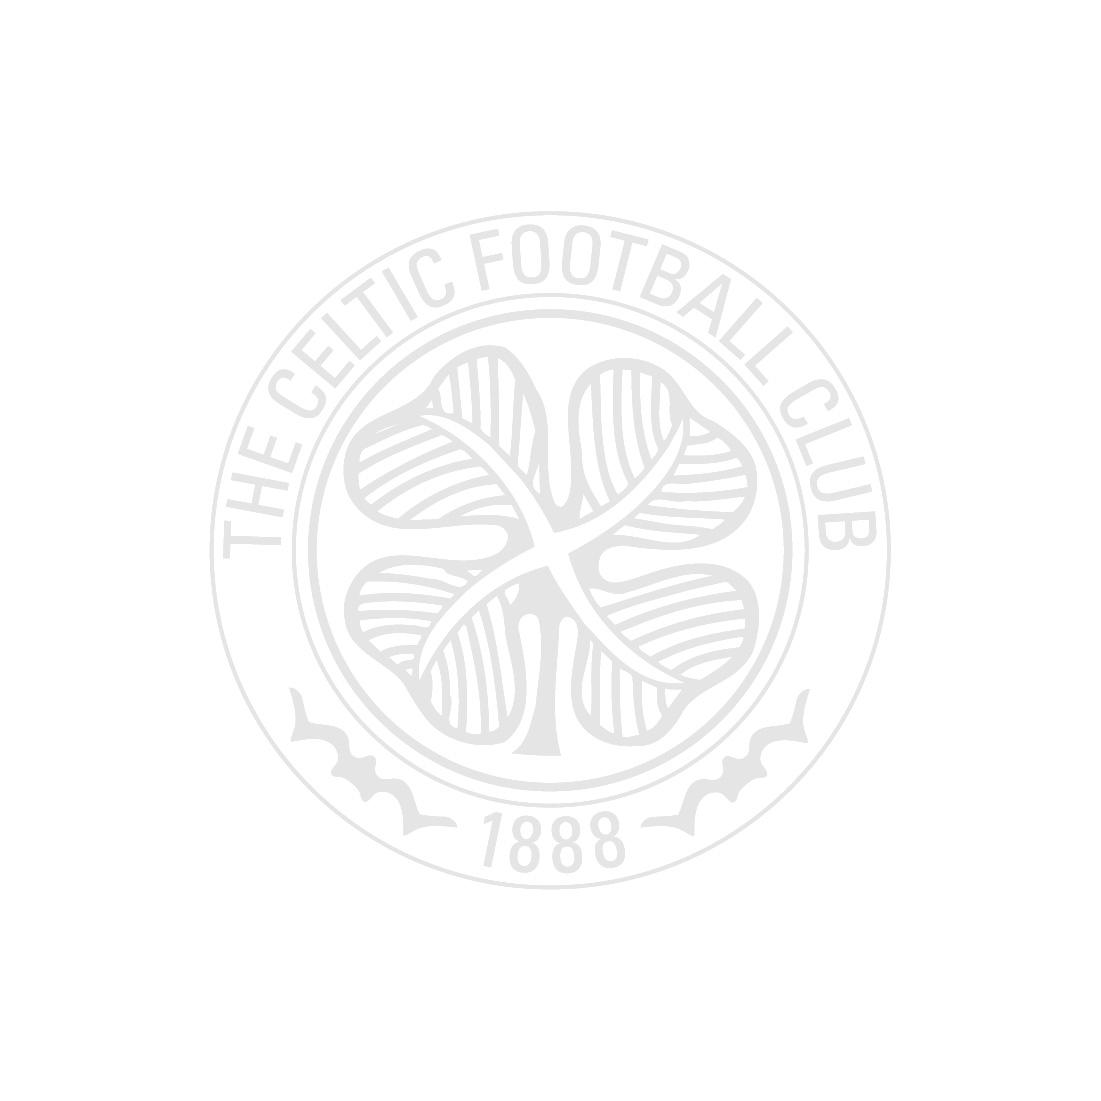 Celtic Euro Training Walk Out Jacket - No Sponsor